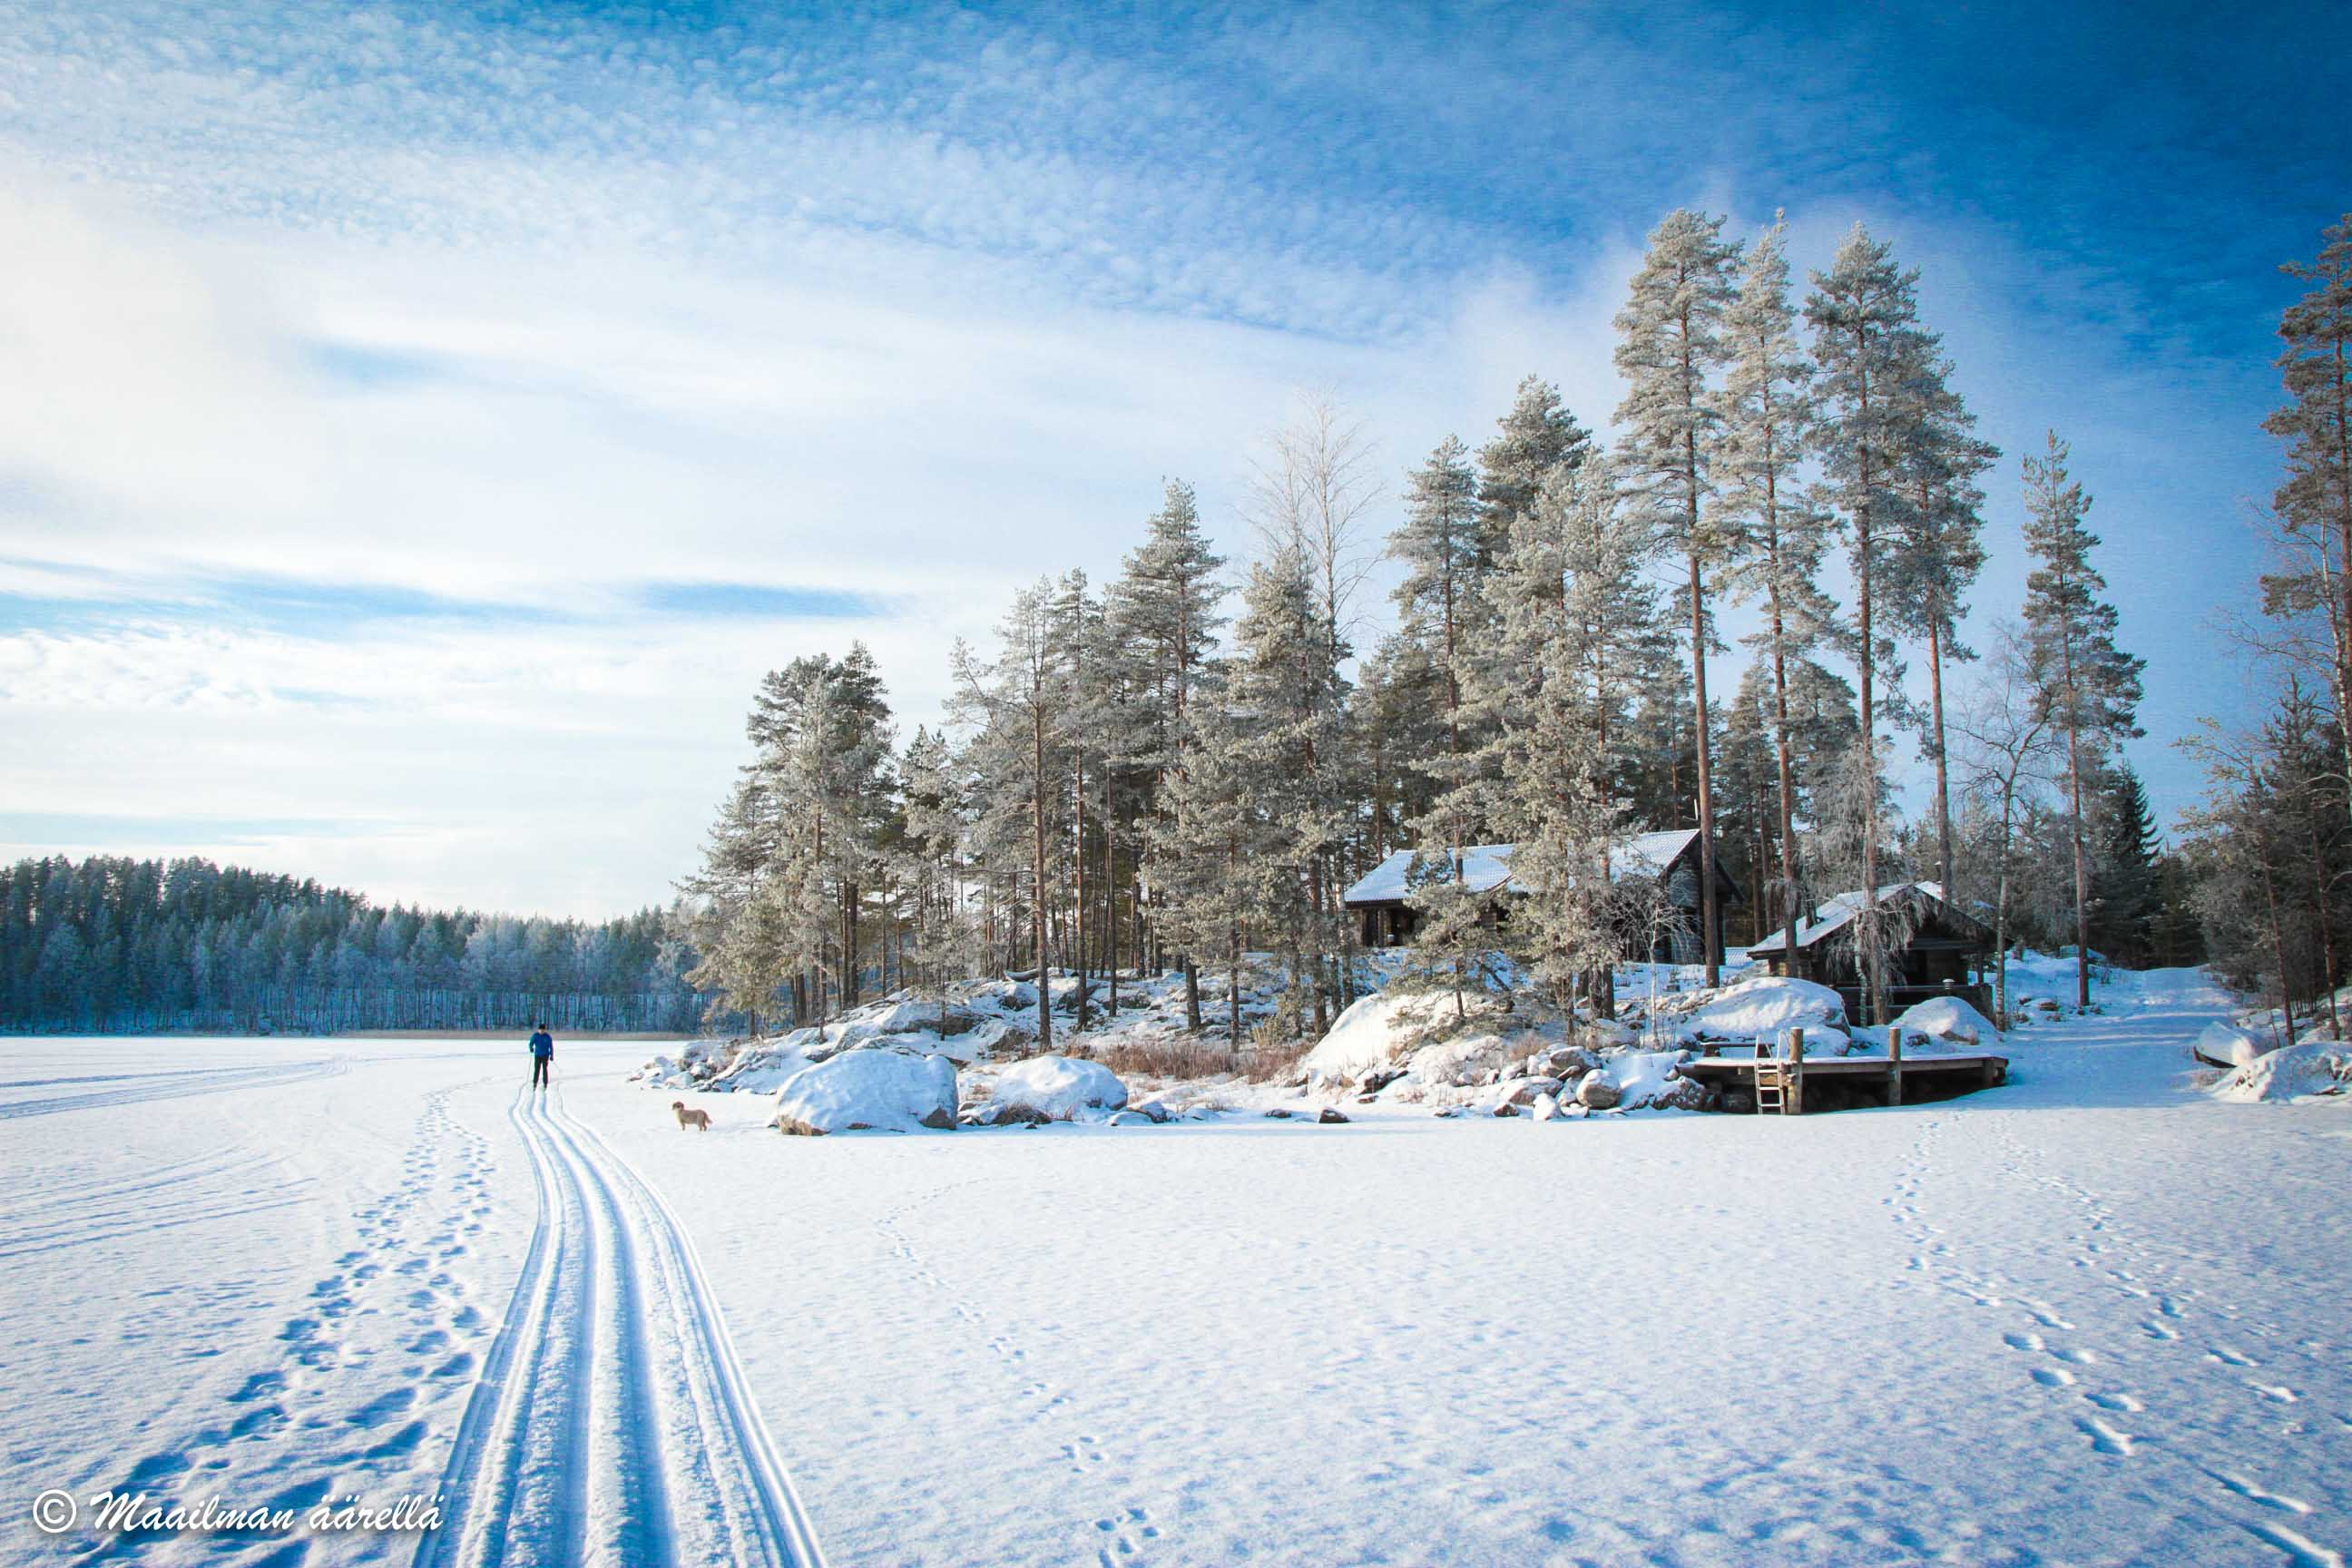 Norppa-Majat, Savonlinna